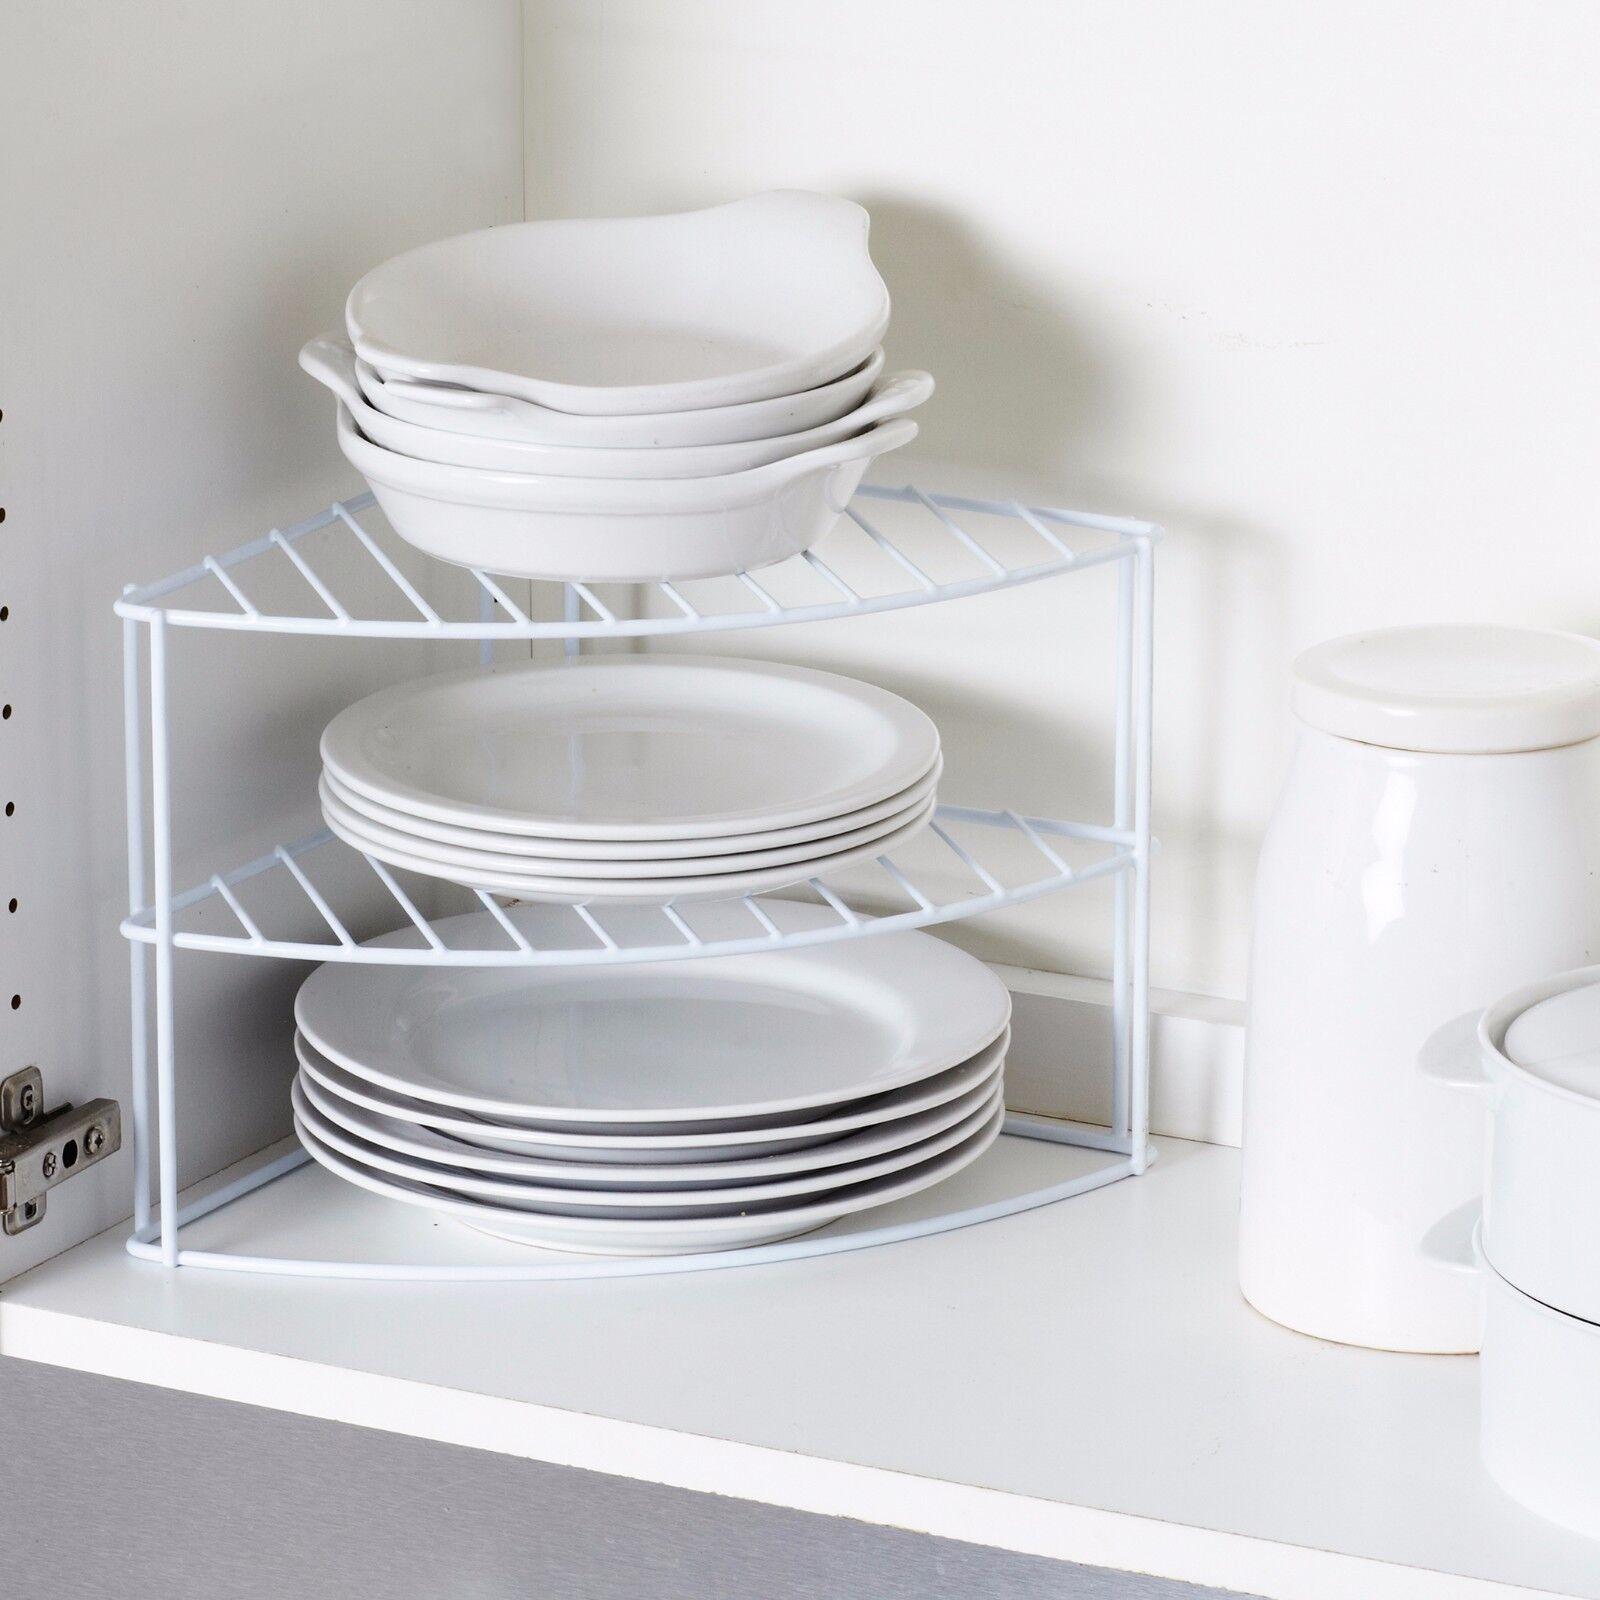 Luxury Drain Frame Crockery Stand Plate Storage Dish Washing Dishes For Sale Ebay